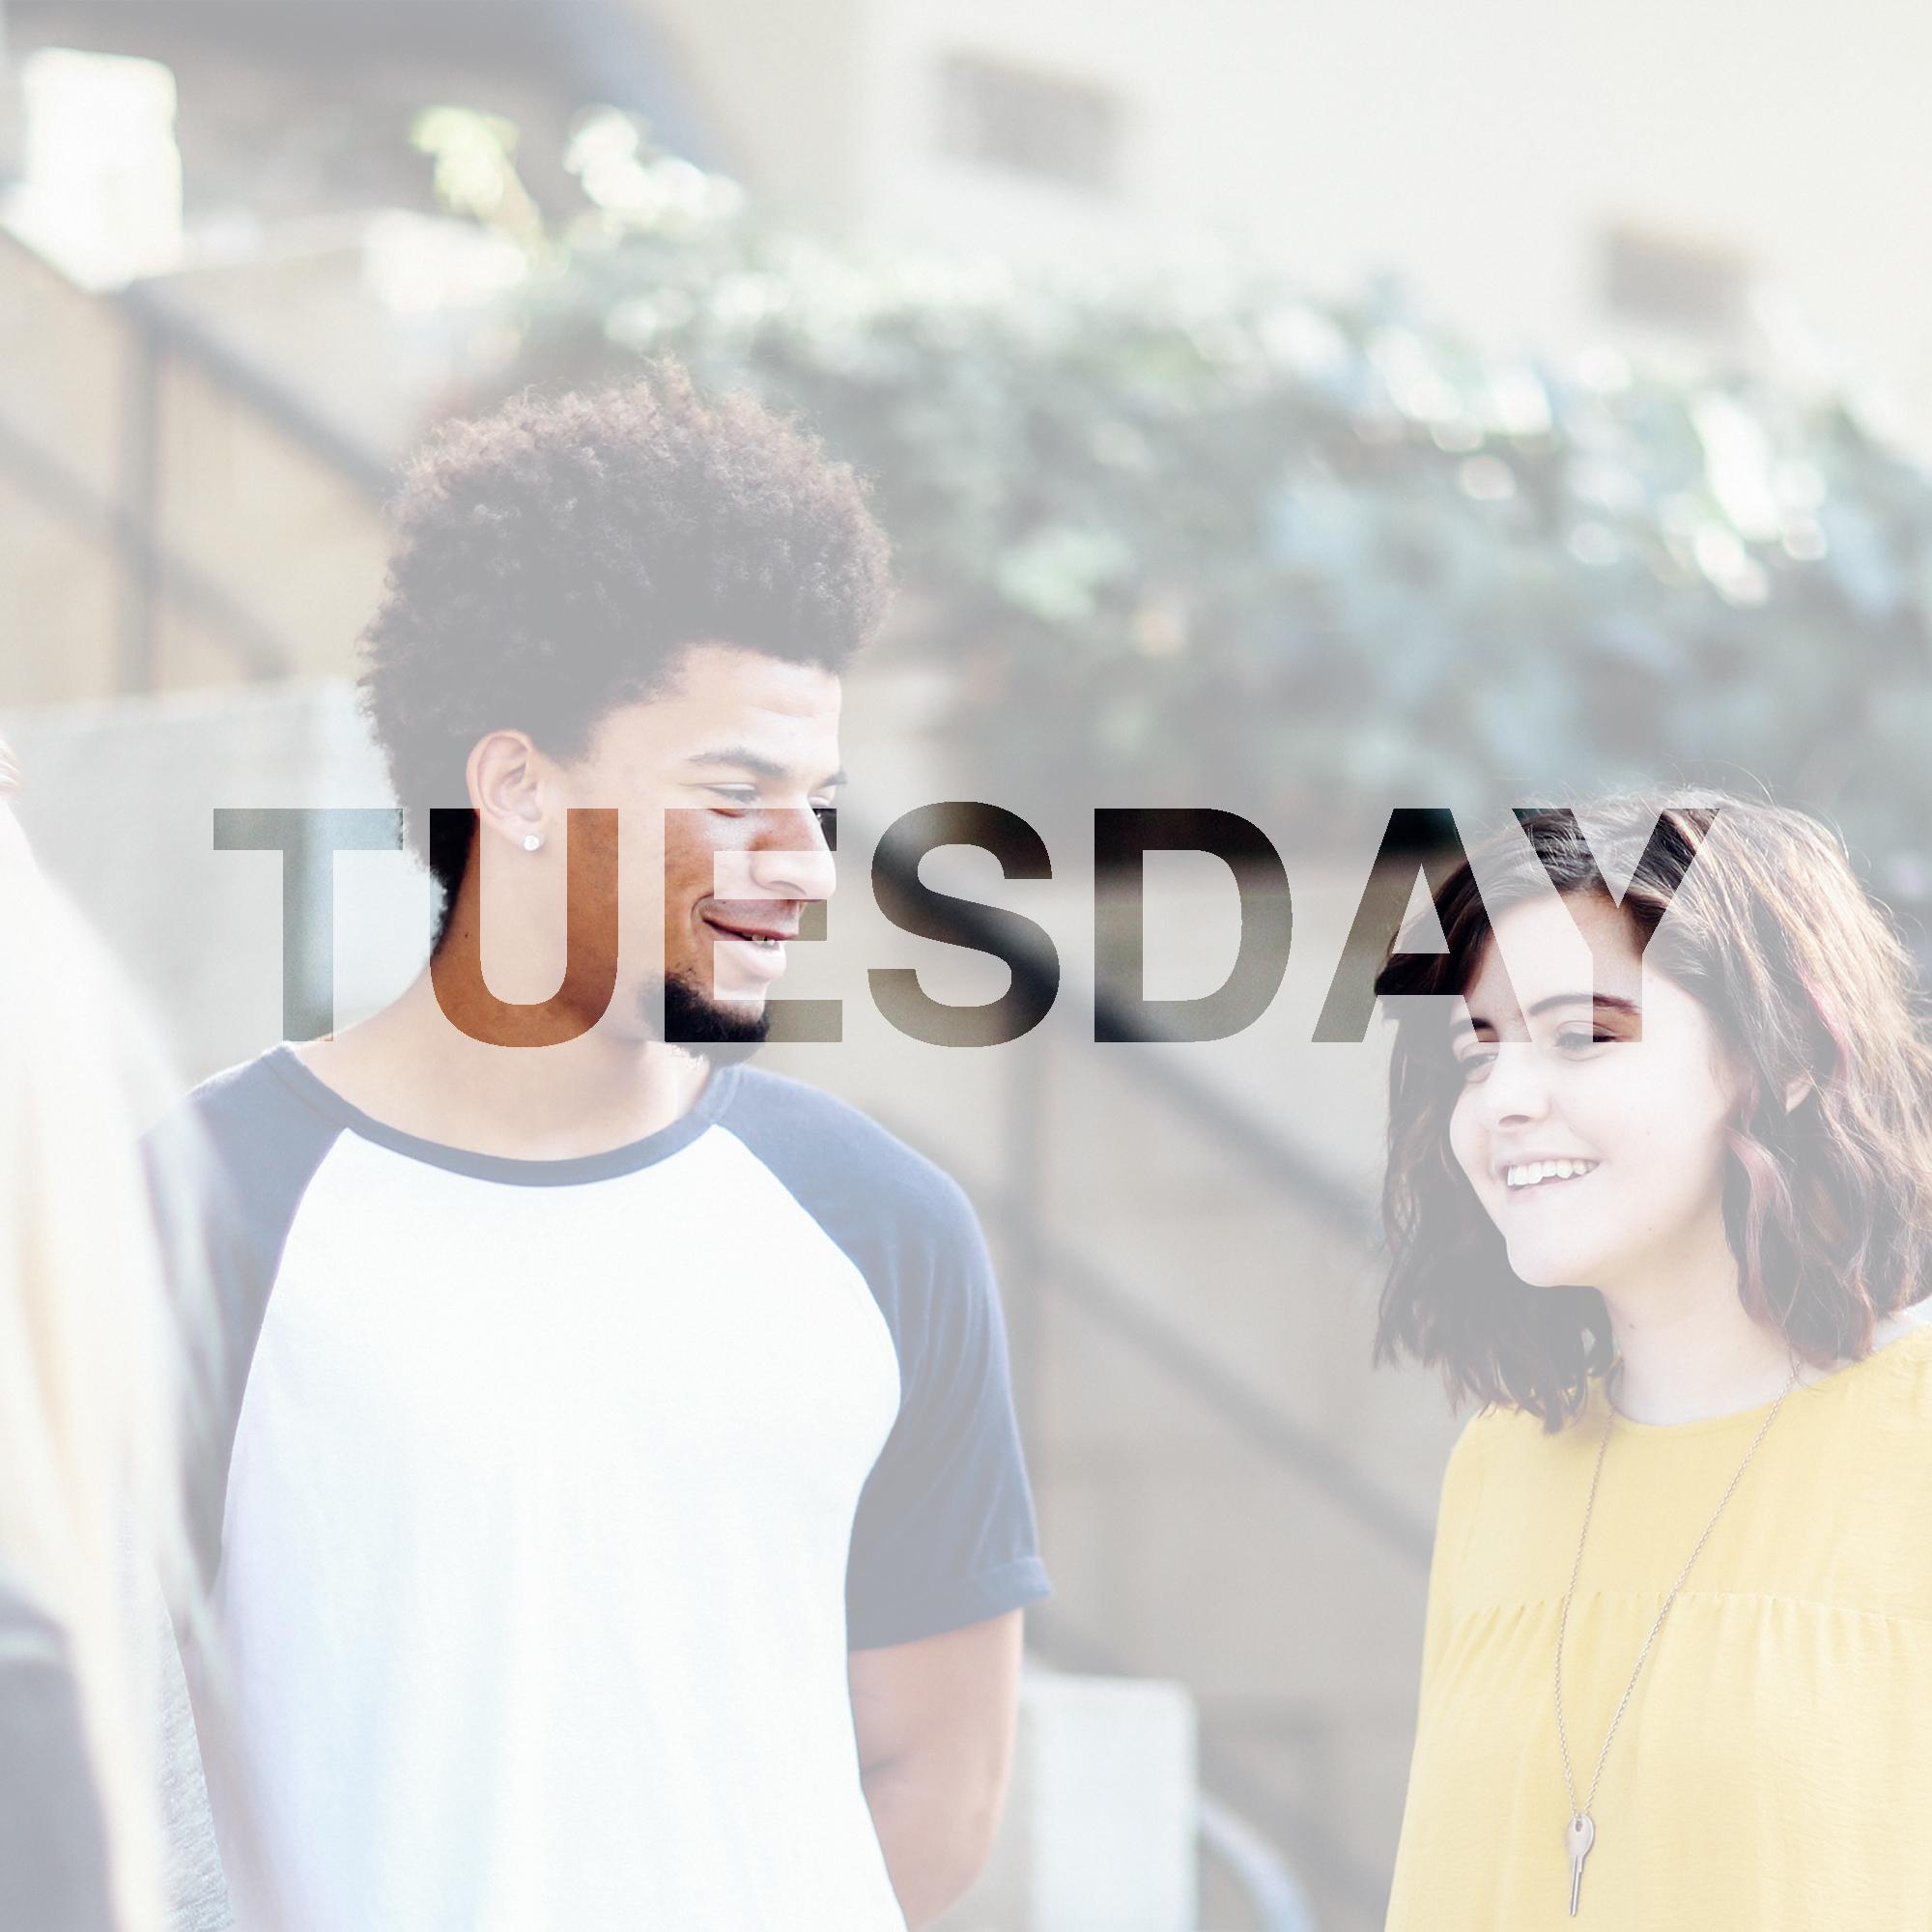 02_Tuesday.jpg